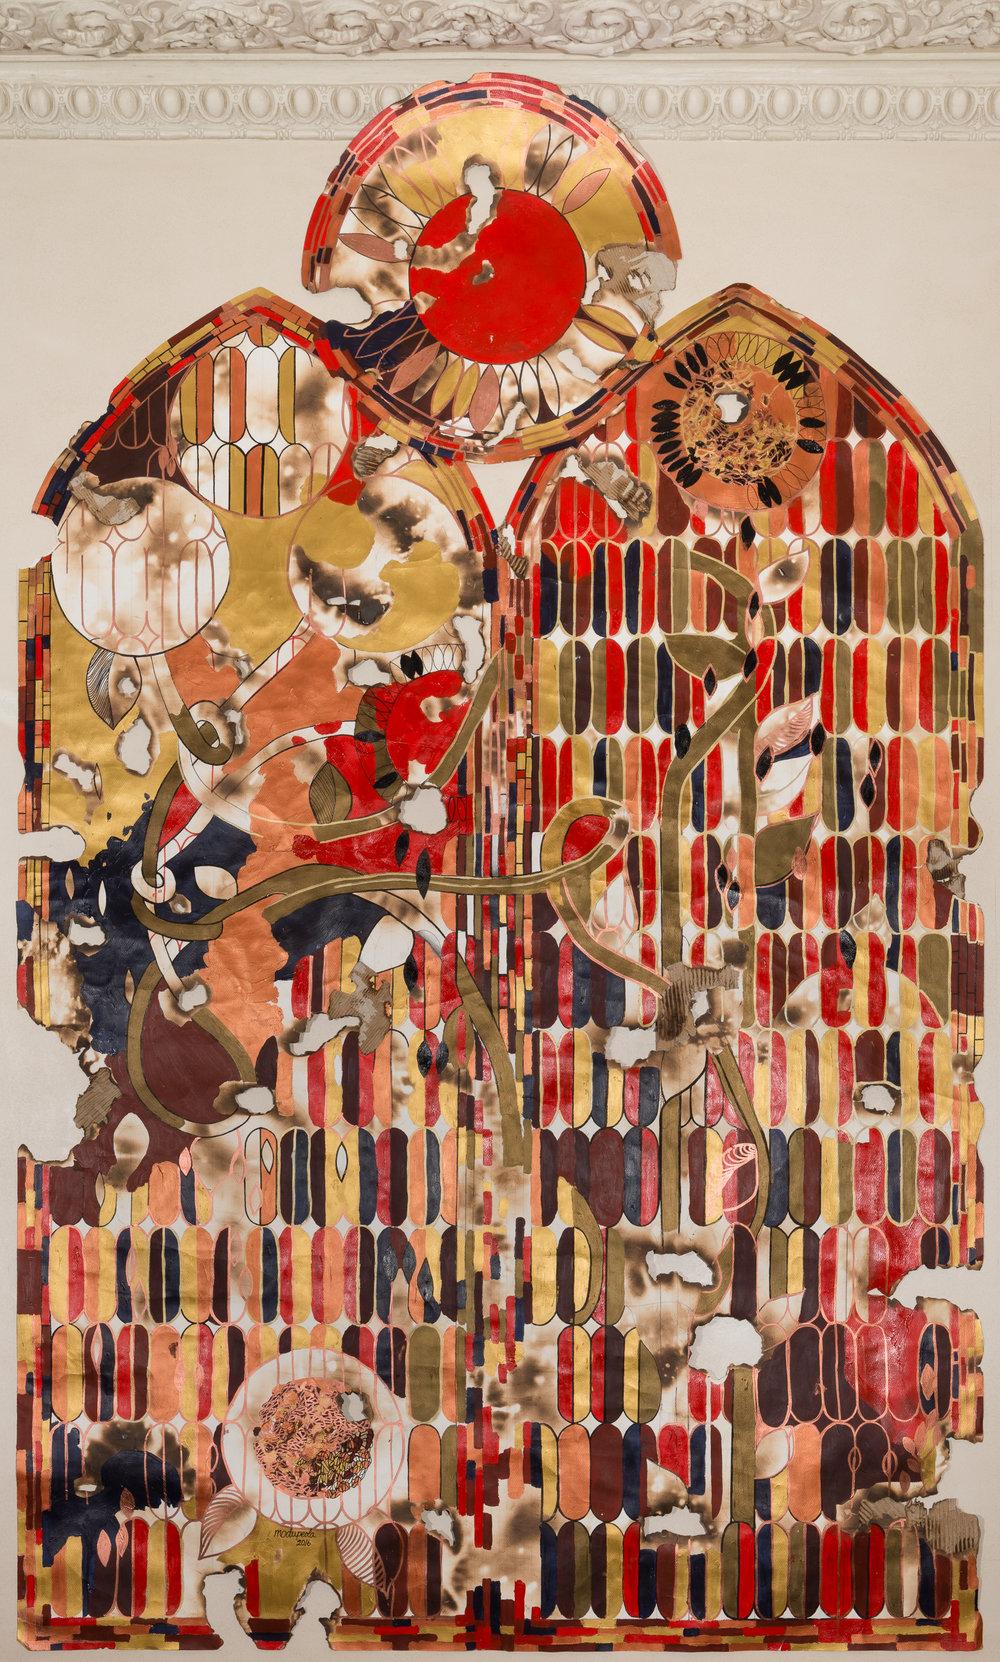 Artwork_Flowers and Prayers III_Alan Roderick.jpg